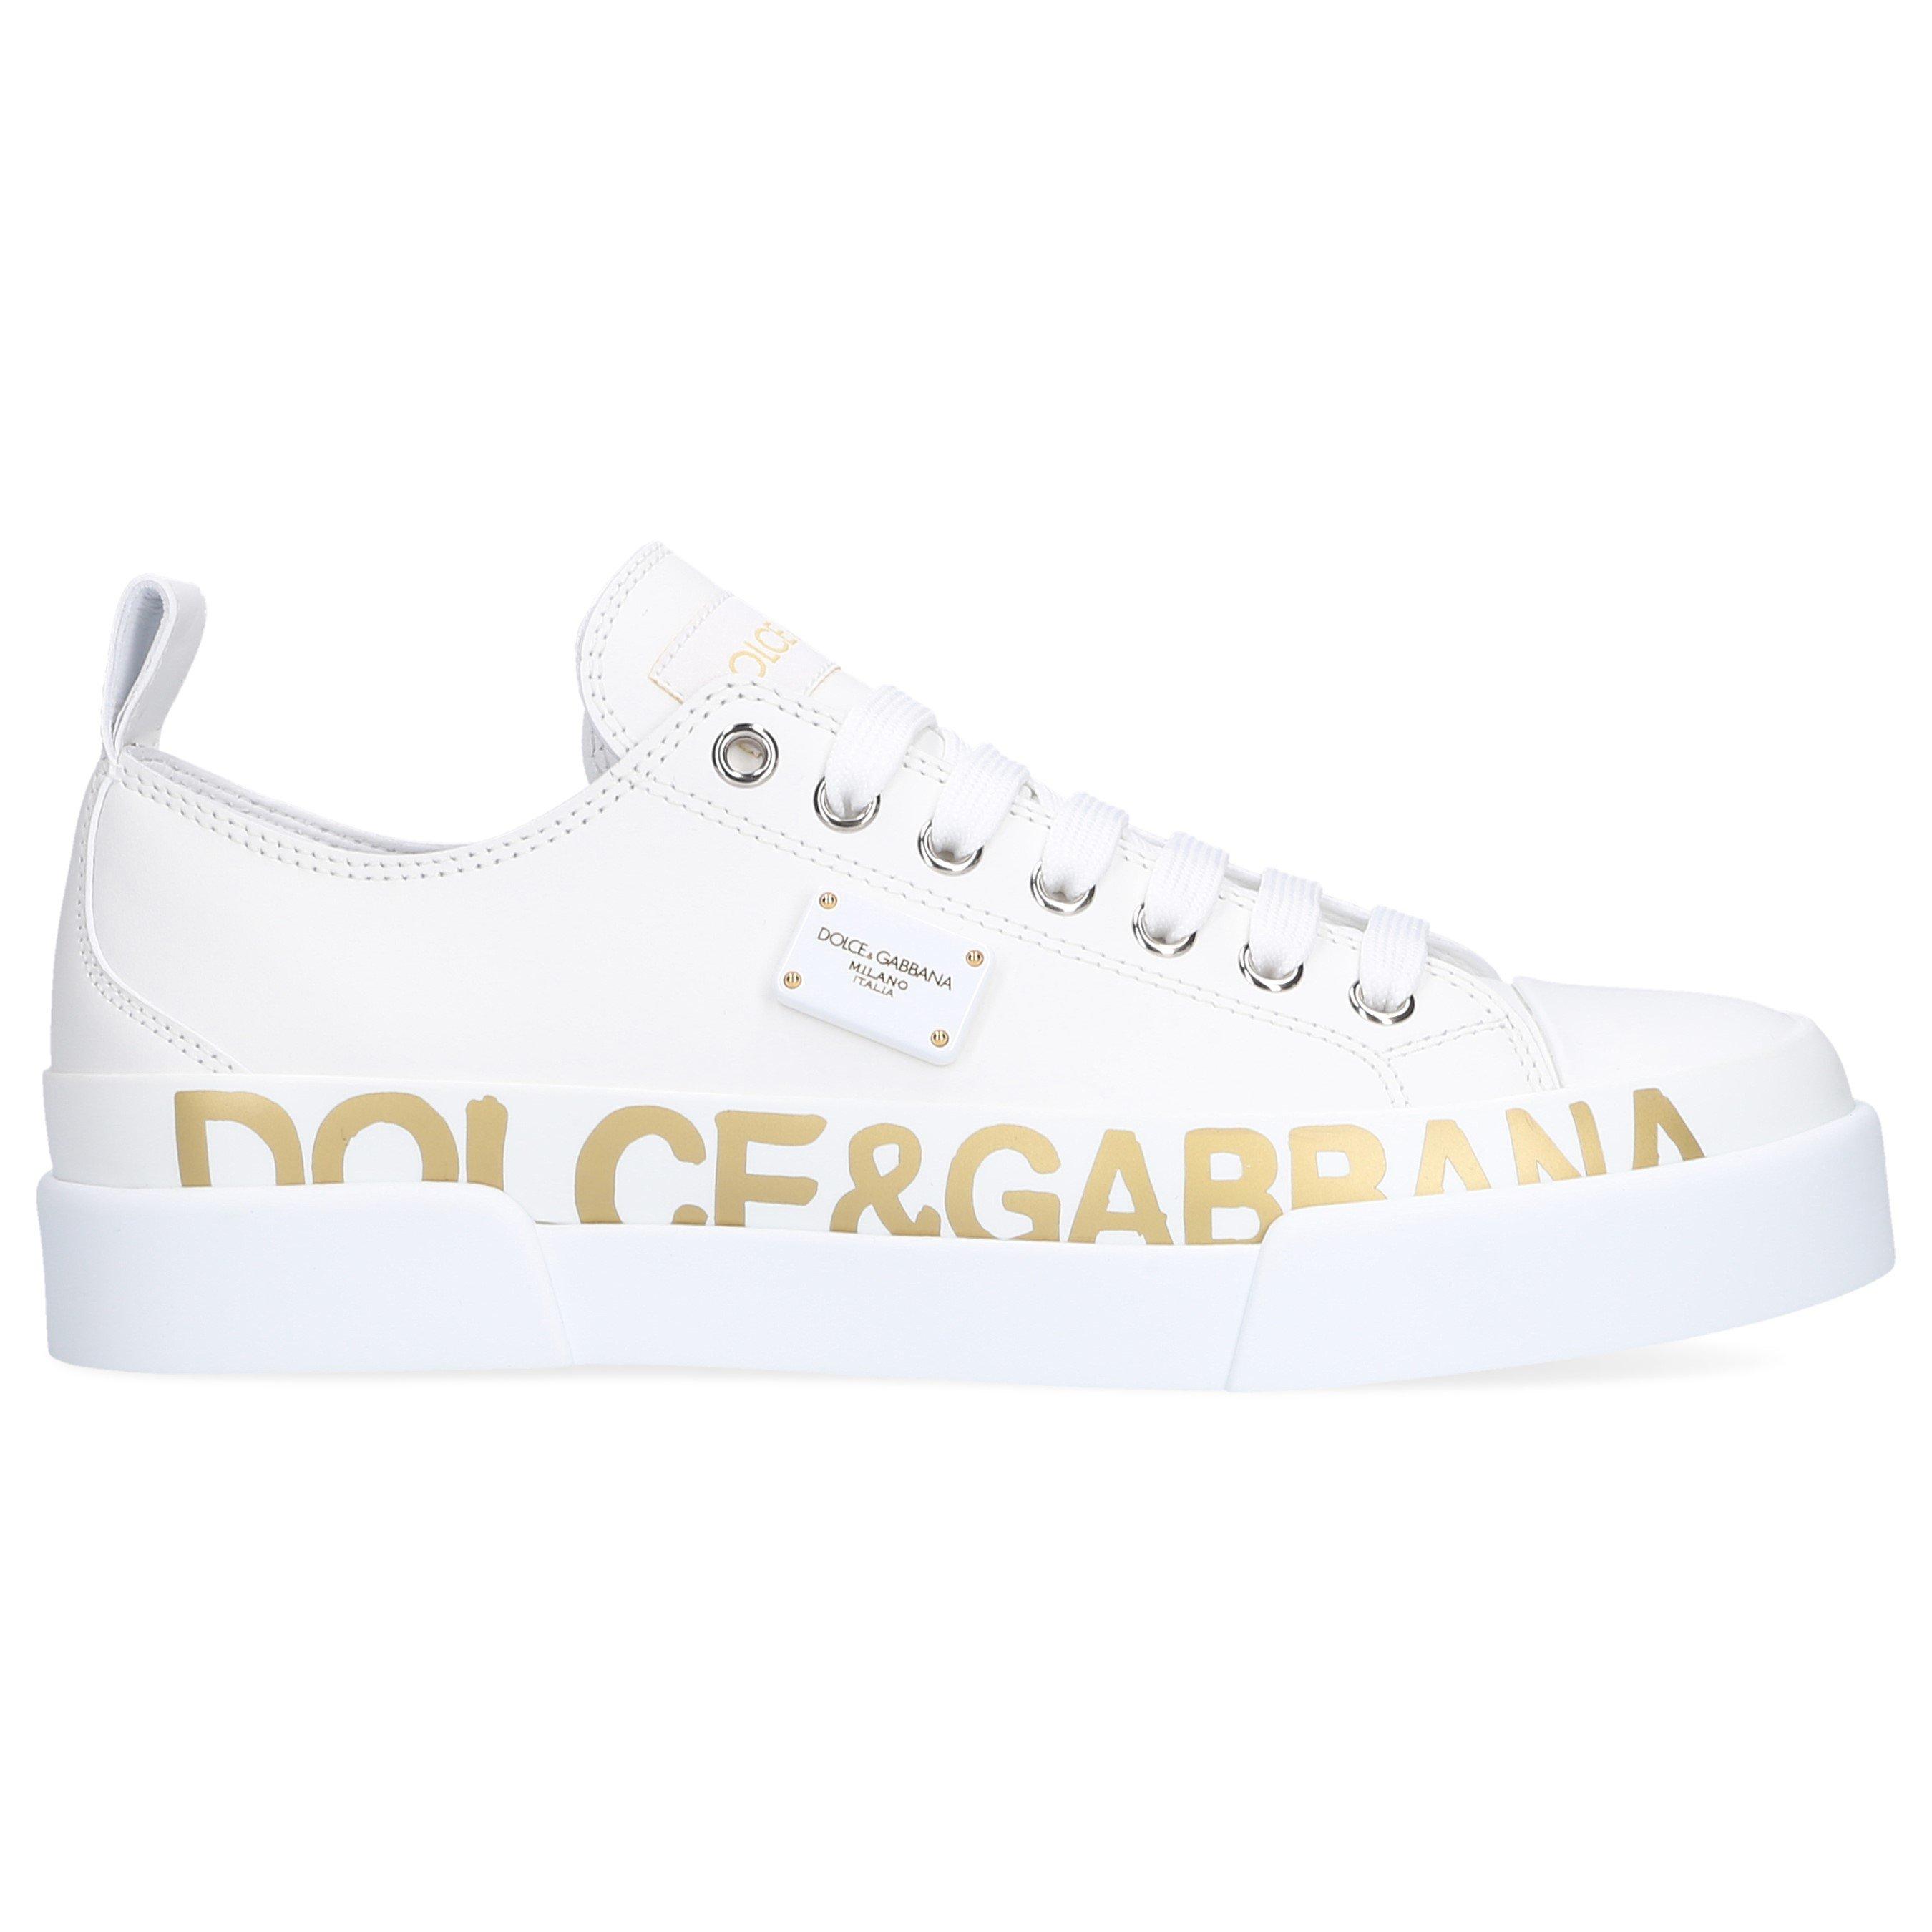 Dolce & Gabbana WOMEN LOW-TOP SNEAKERS CK1886